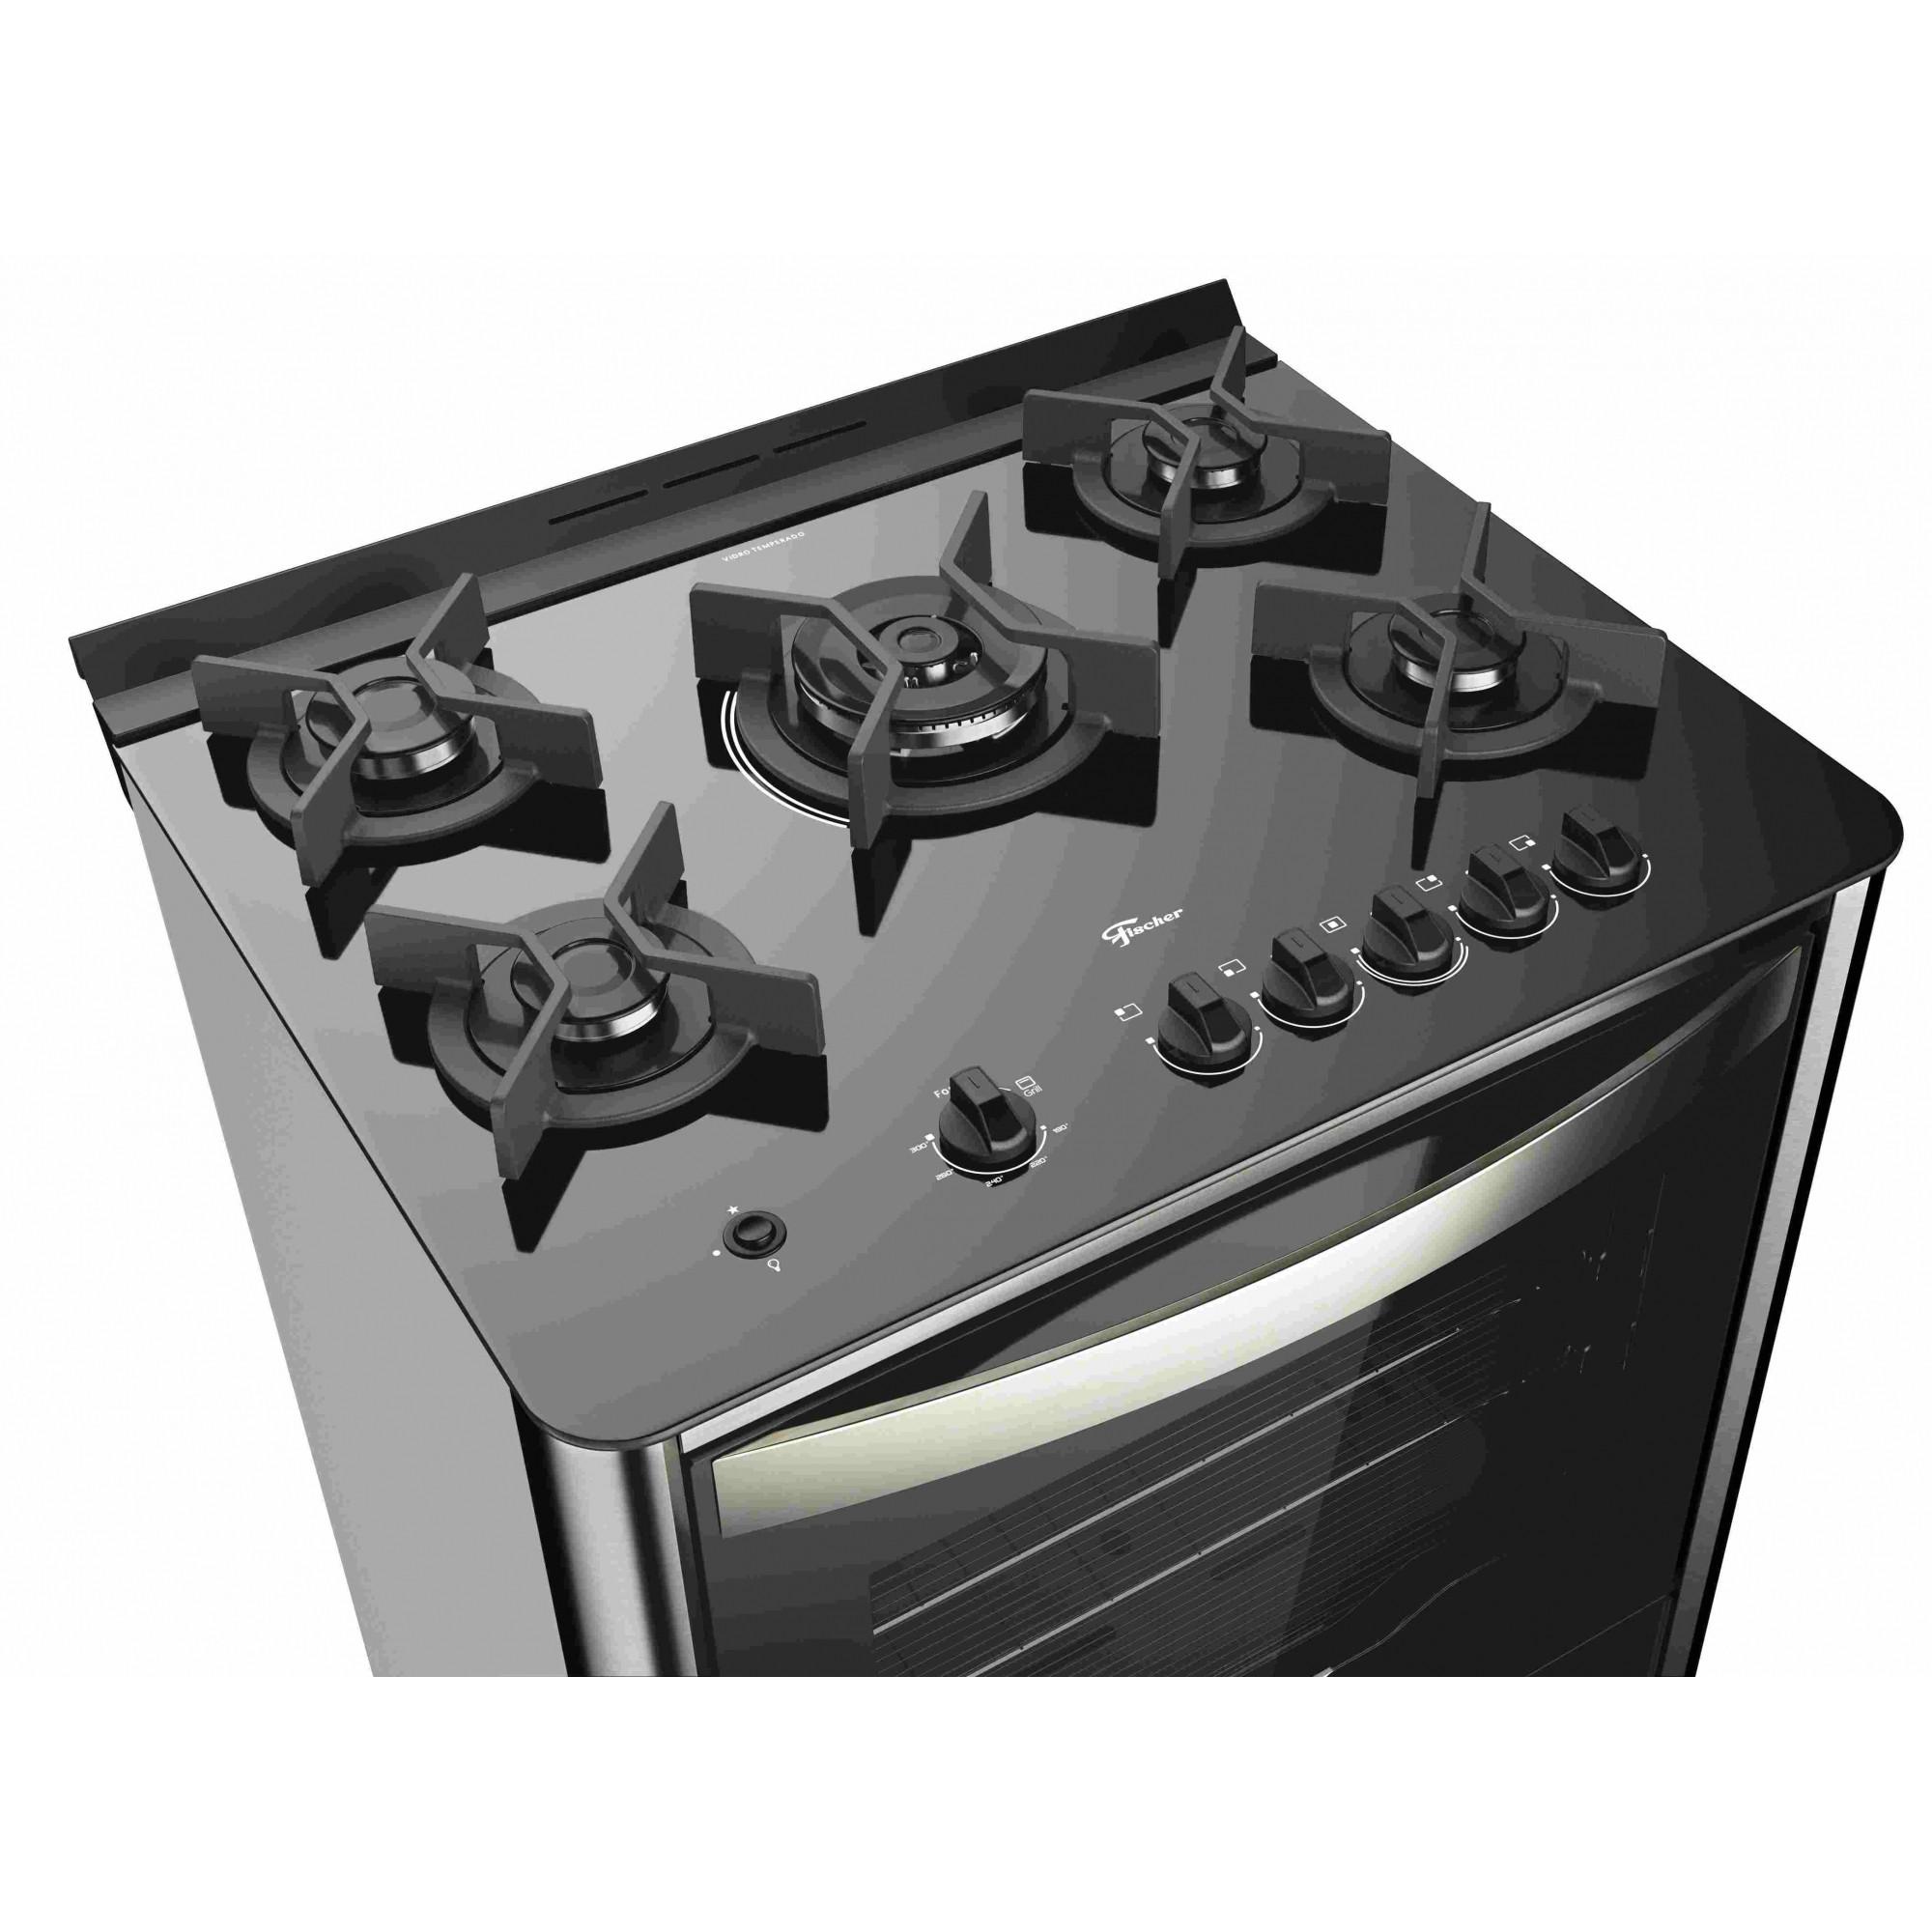 Fogão de Piso Fischer 5Q Gran Cheff Gás Inox com Grill - 26988